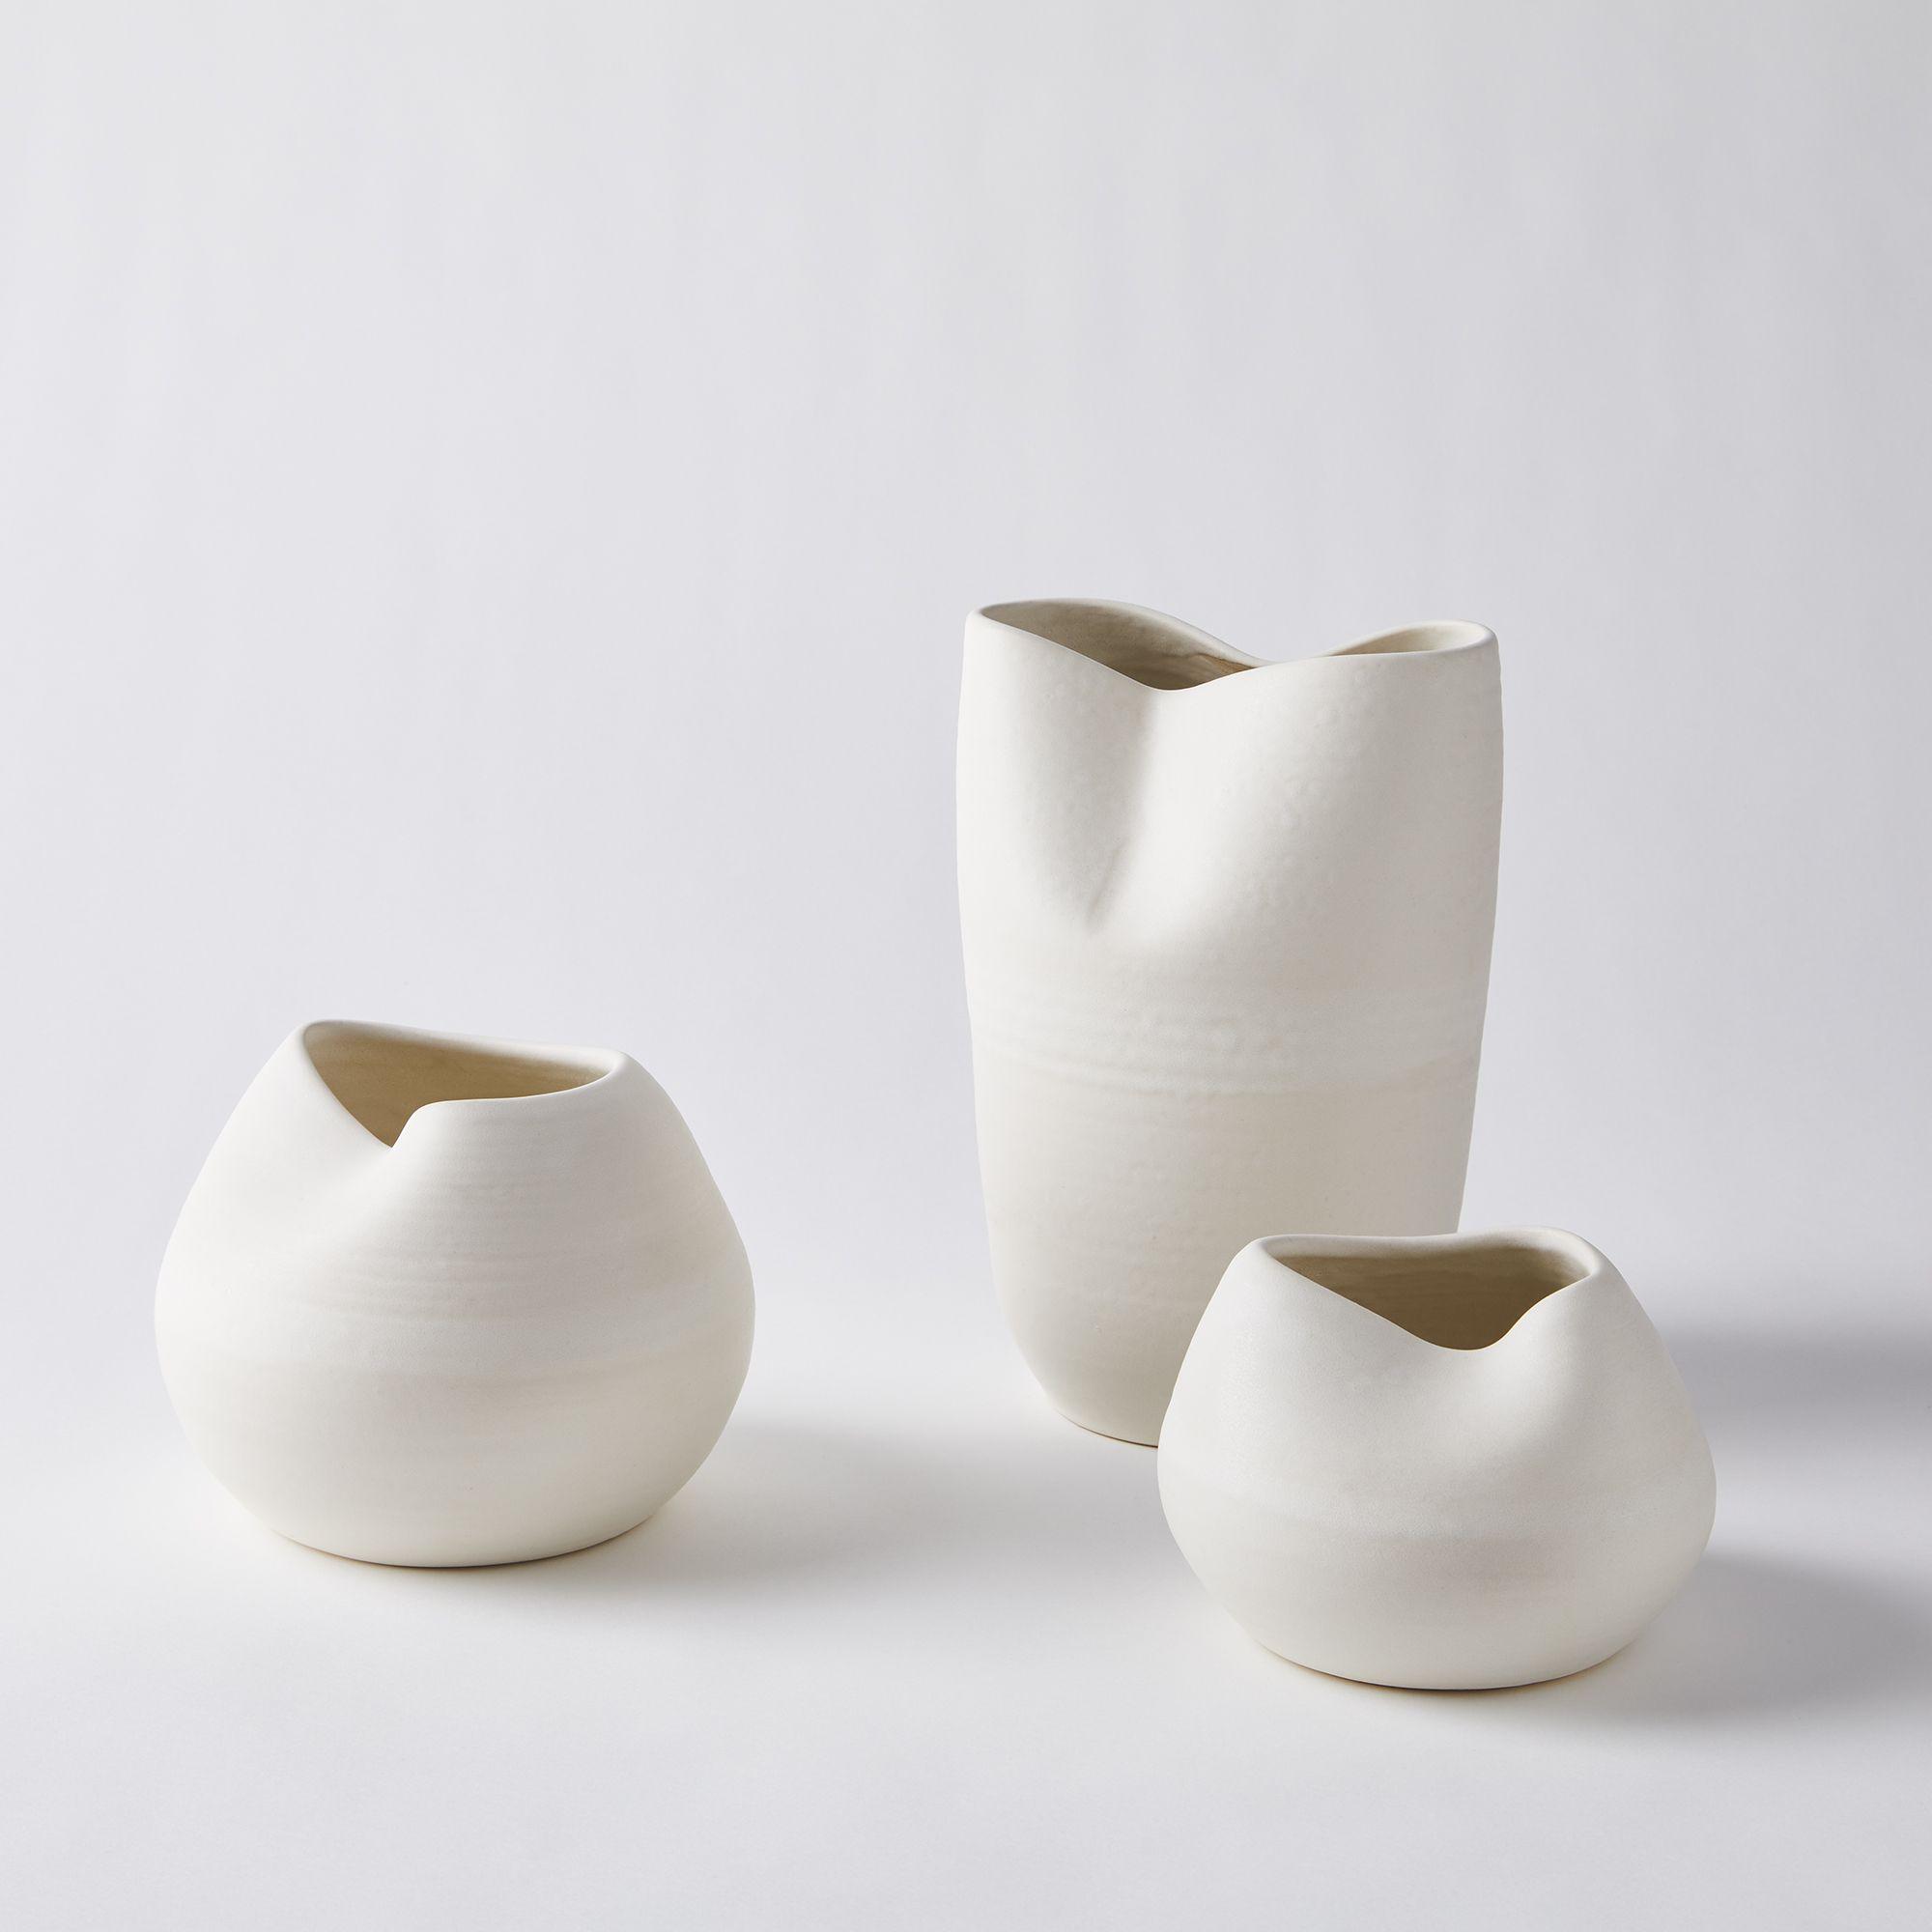 Handmade Ceramic Stella Vases (Set of 3) $660